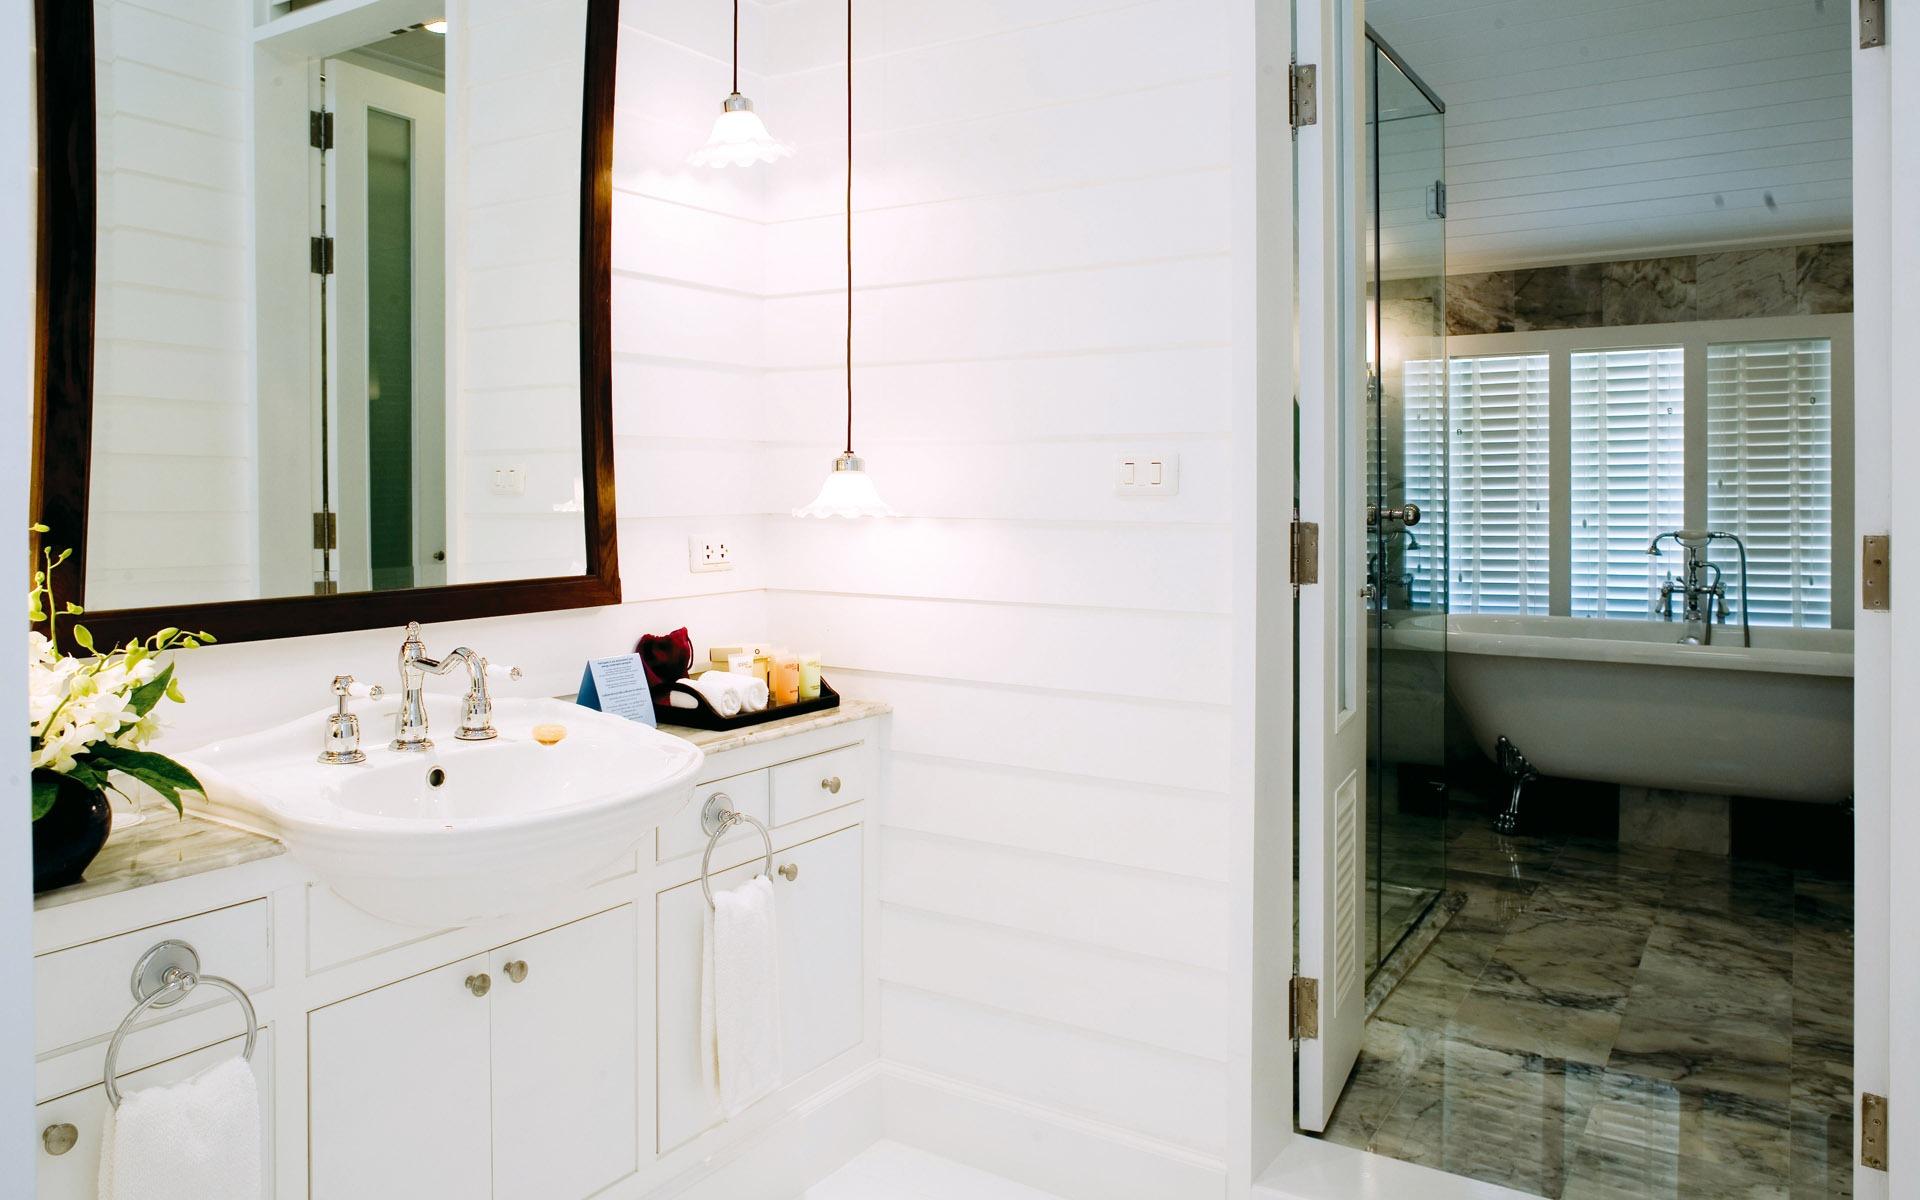 Fond d 39 cran photo salle de bain 1 7 1920x1200 fond d for Ecran salle de bain